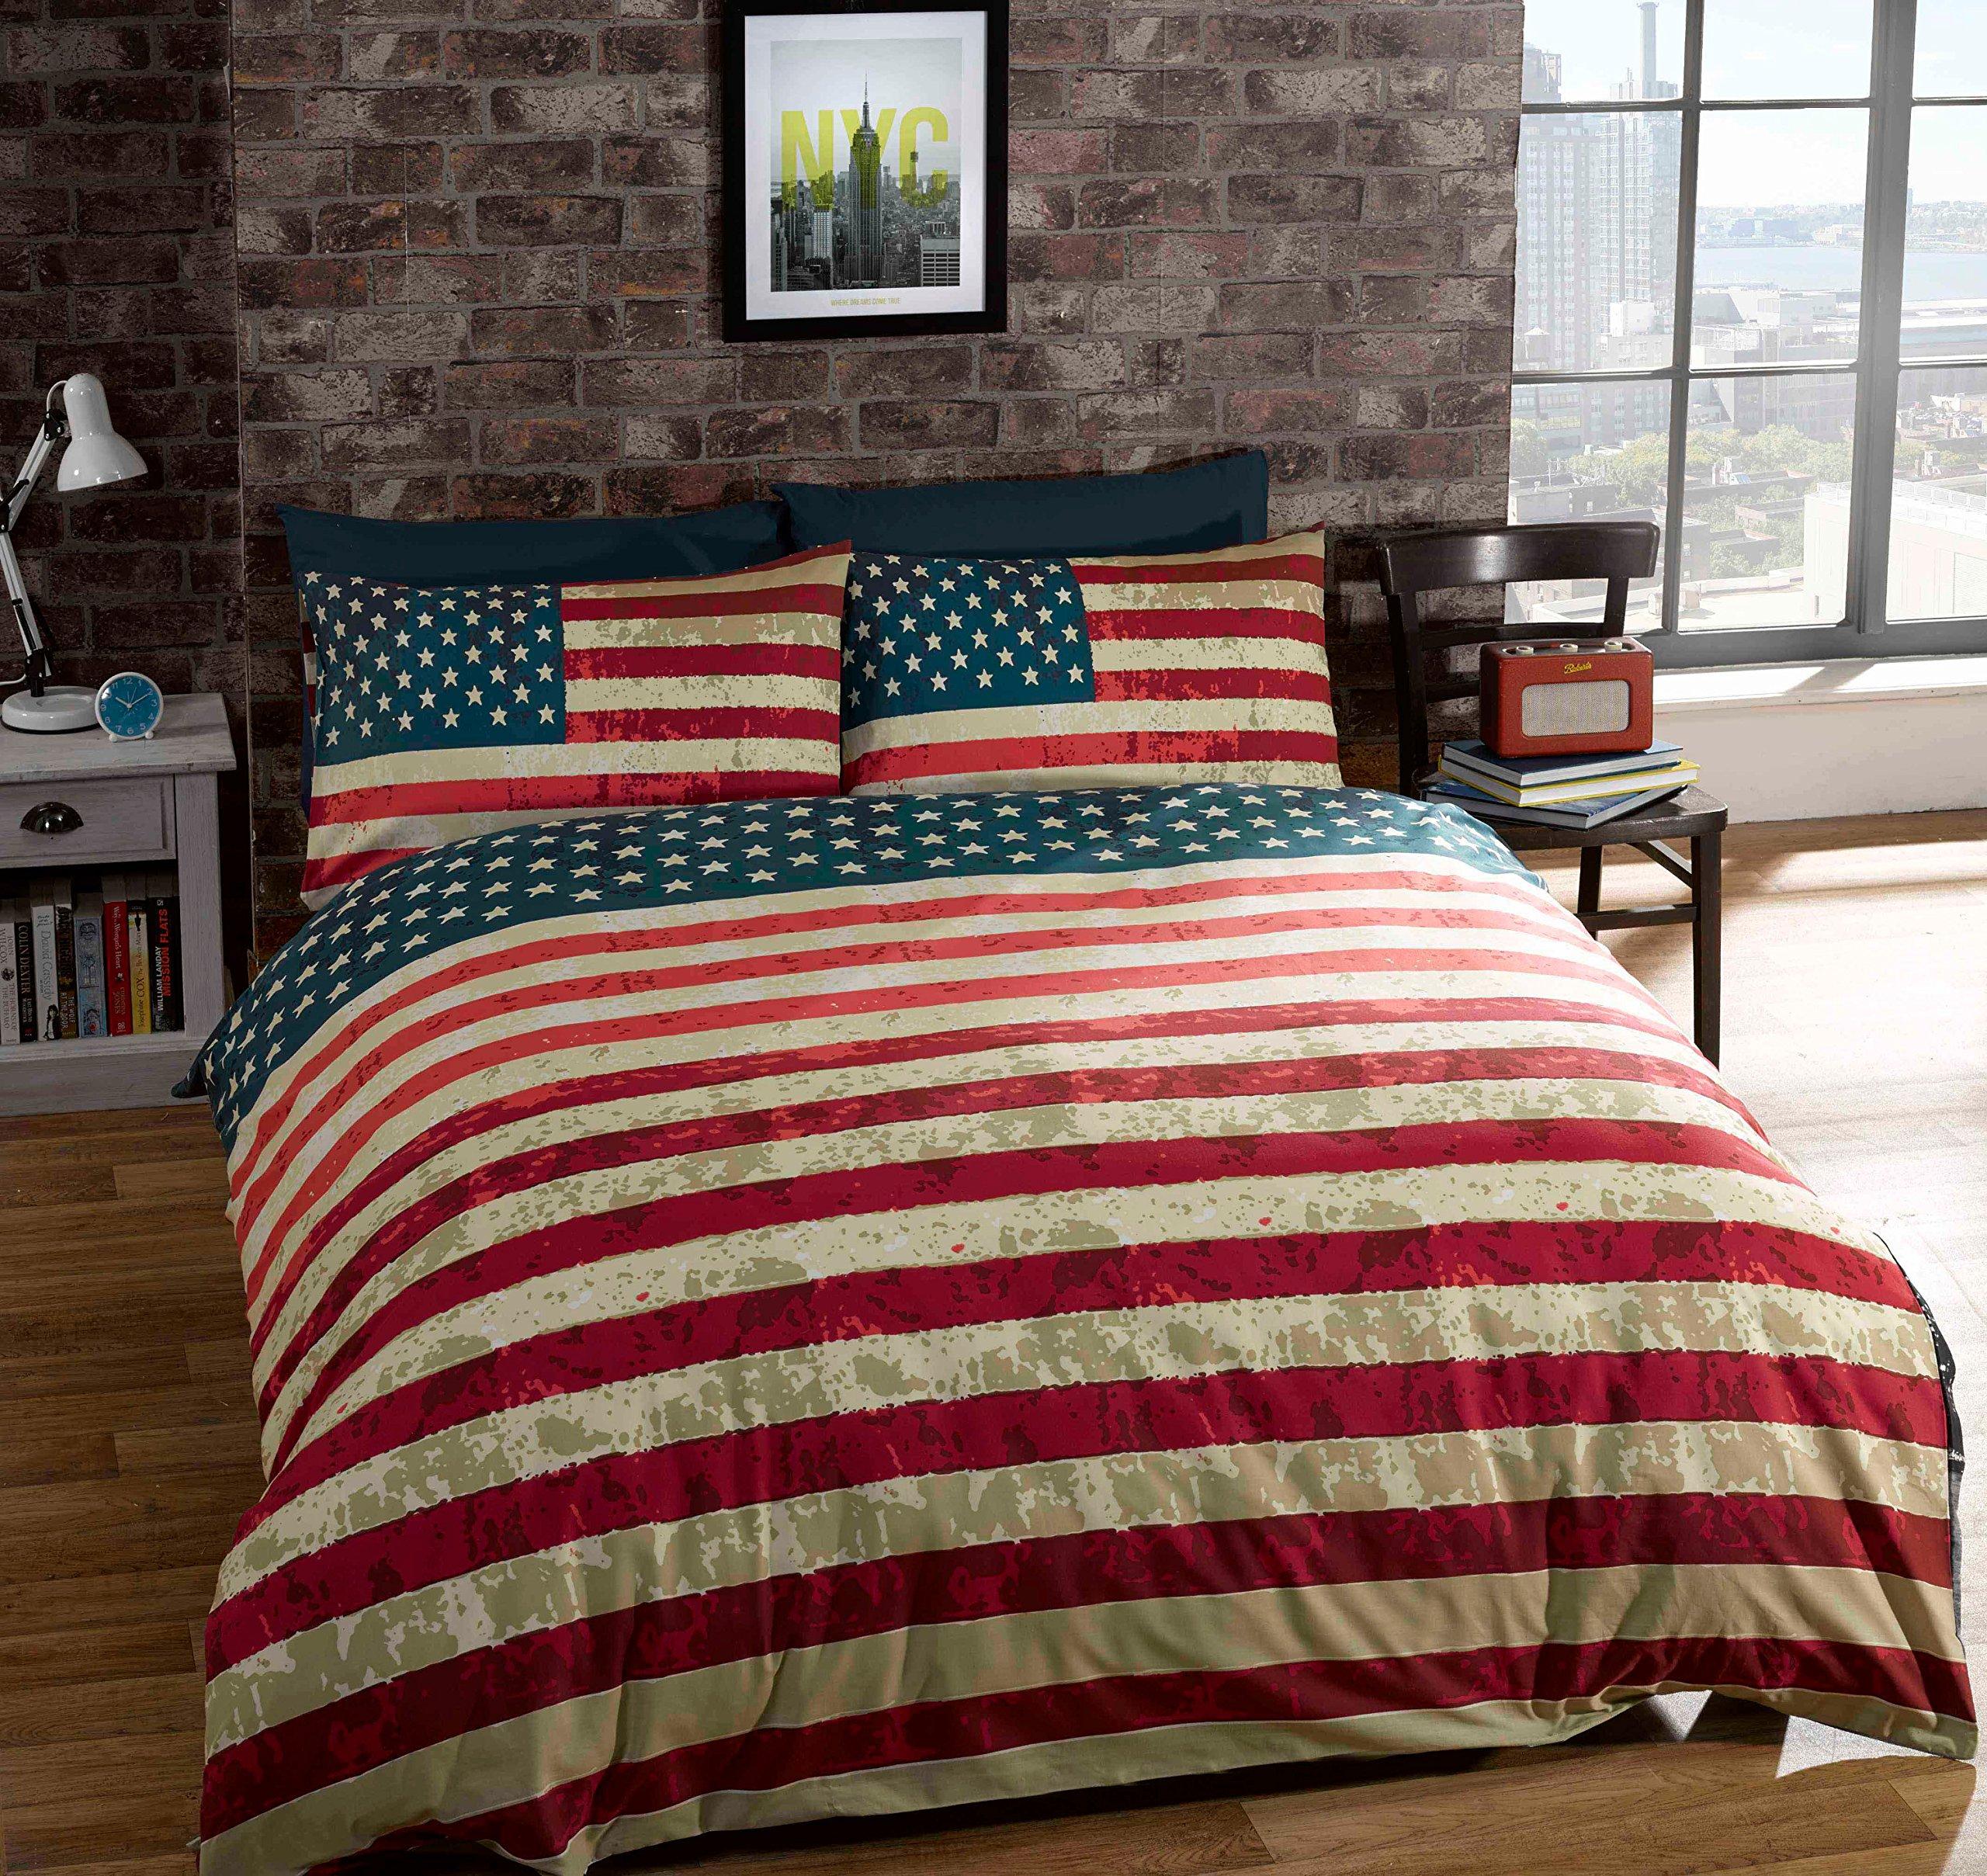 QUEEN SIZE (230 X 220CM - UK KING SIZE) AMERICAN UNITED STATES FLAG REVERSIBLE COTTON BLEND BLUE COMFORTER DUVET COVER